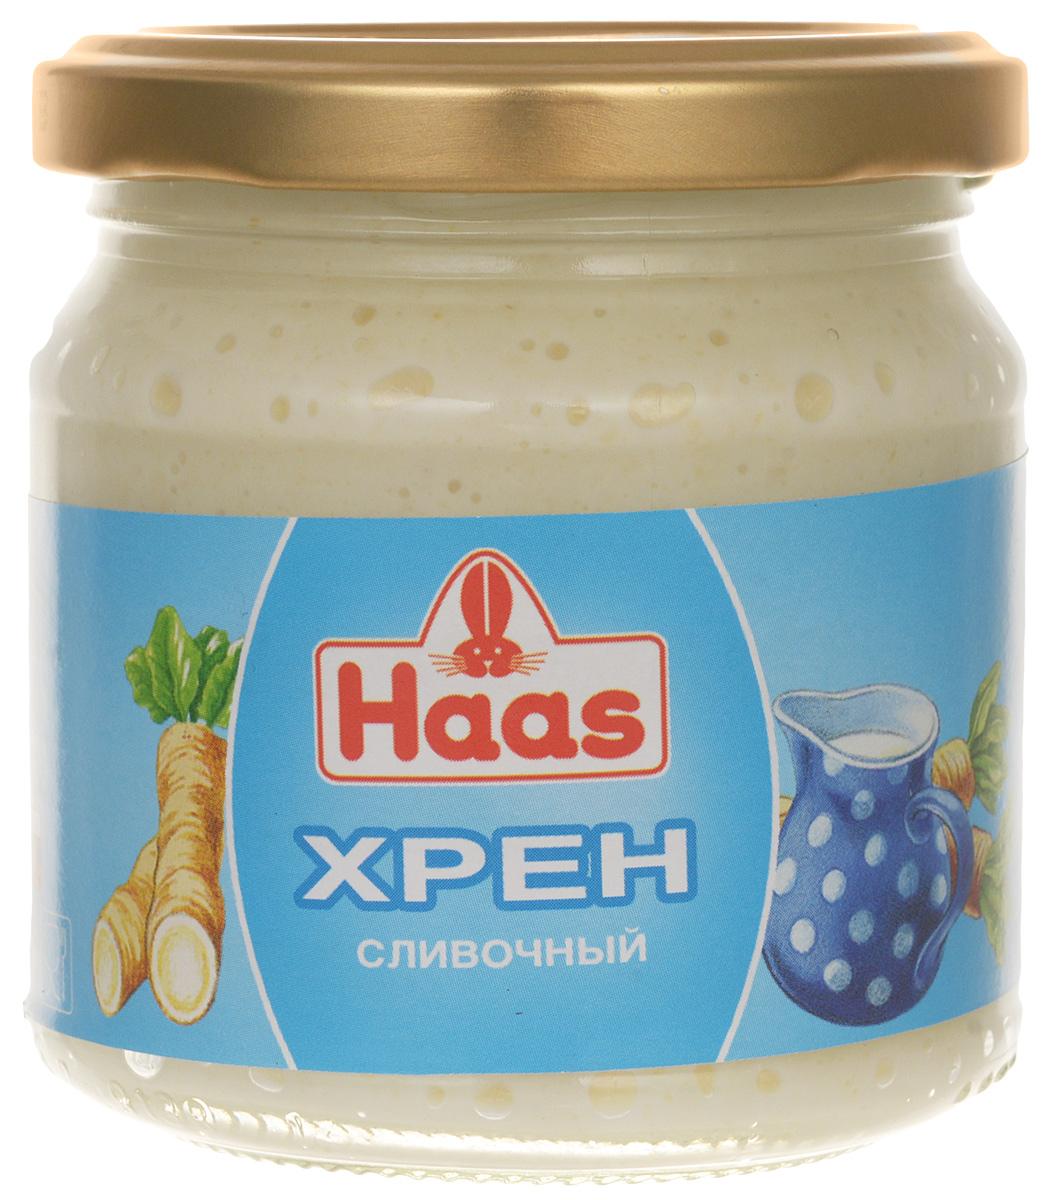 Haas хрен сливочный, 190 г